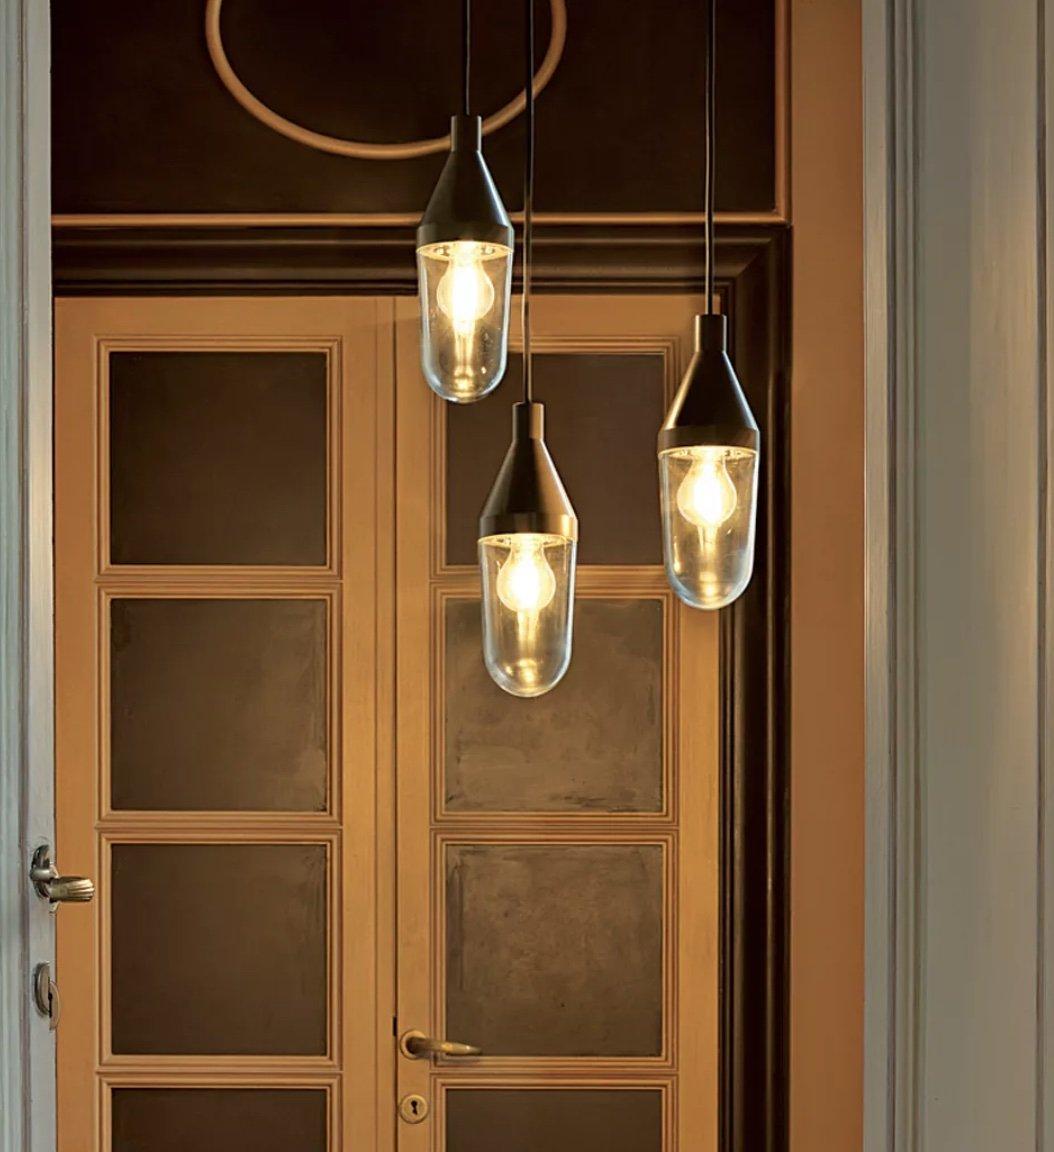 Niwa Suspension Lamp lighting from Oluce, designed by Christophe Pillet